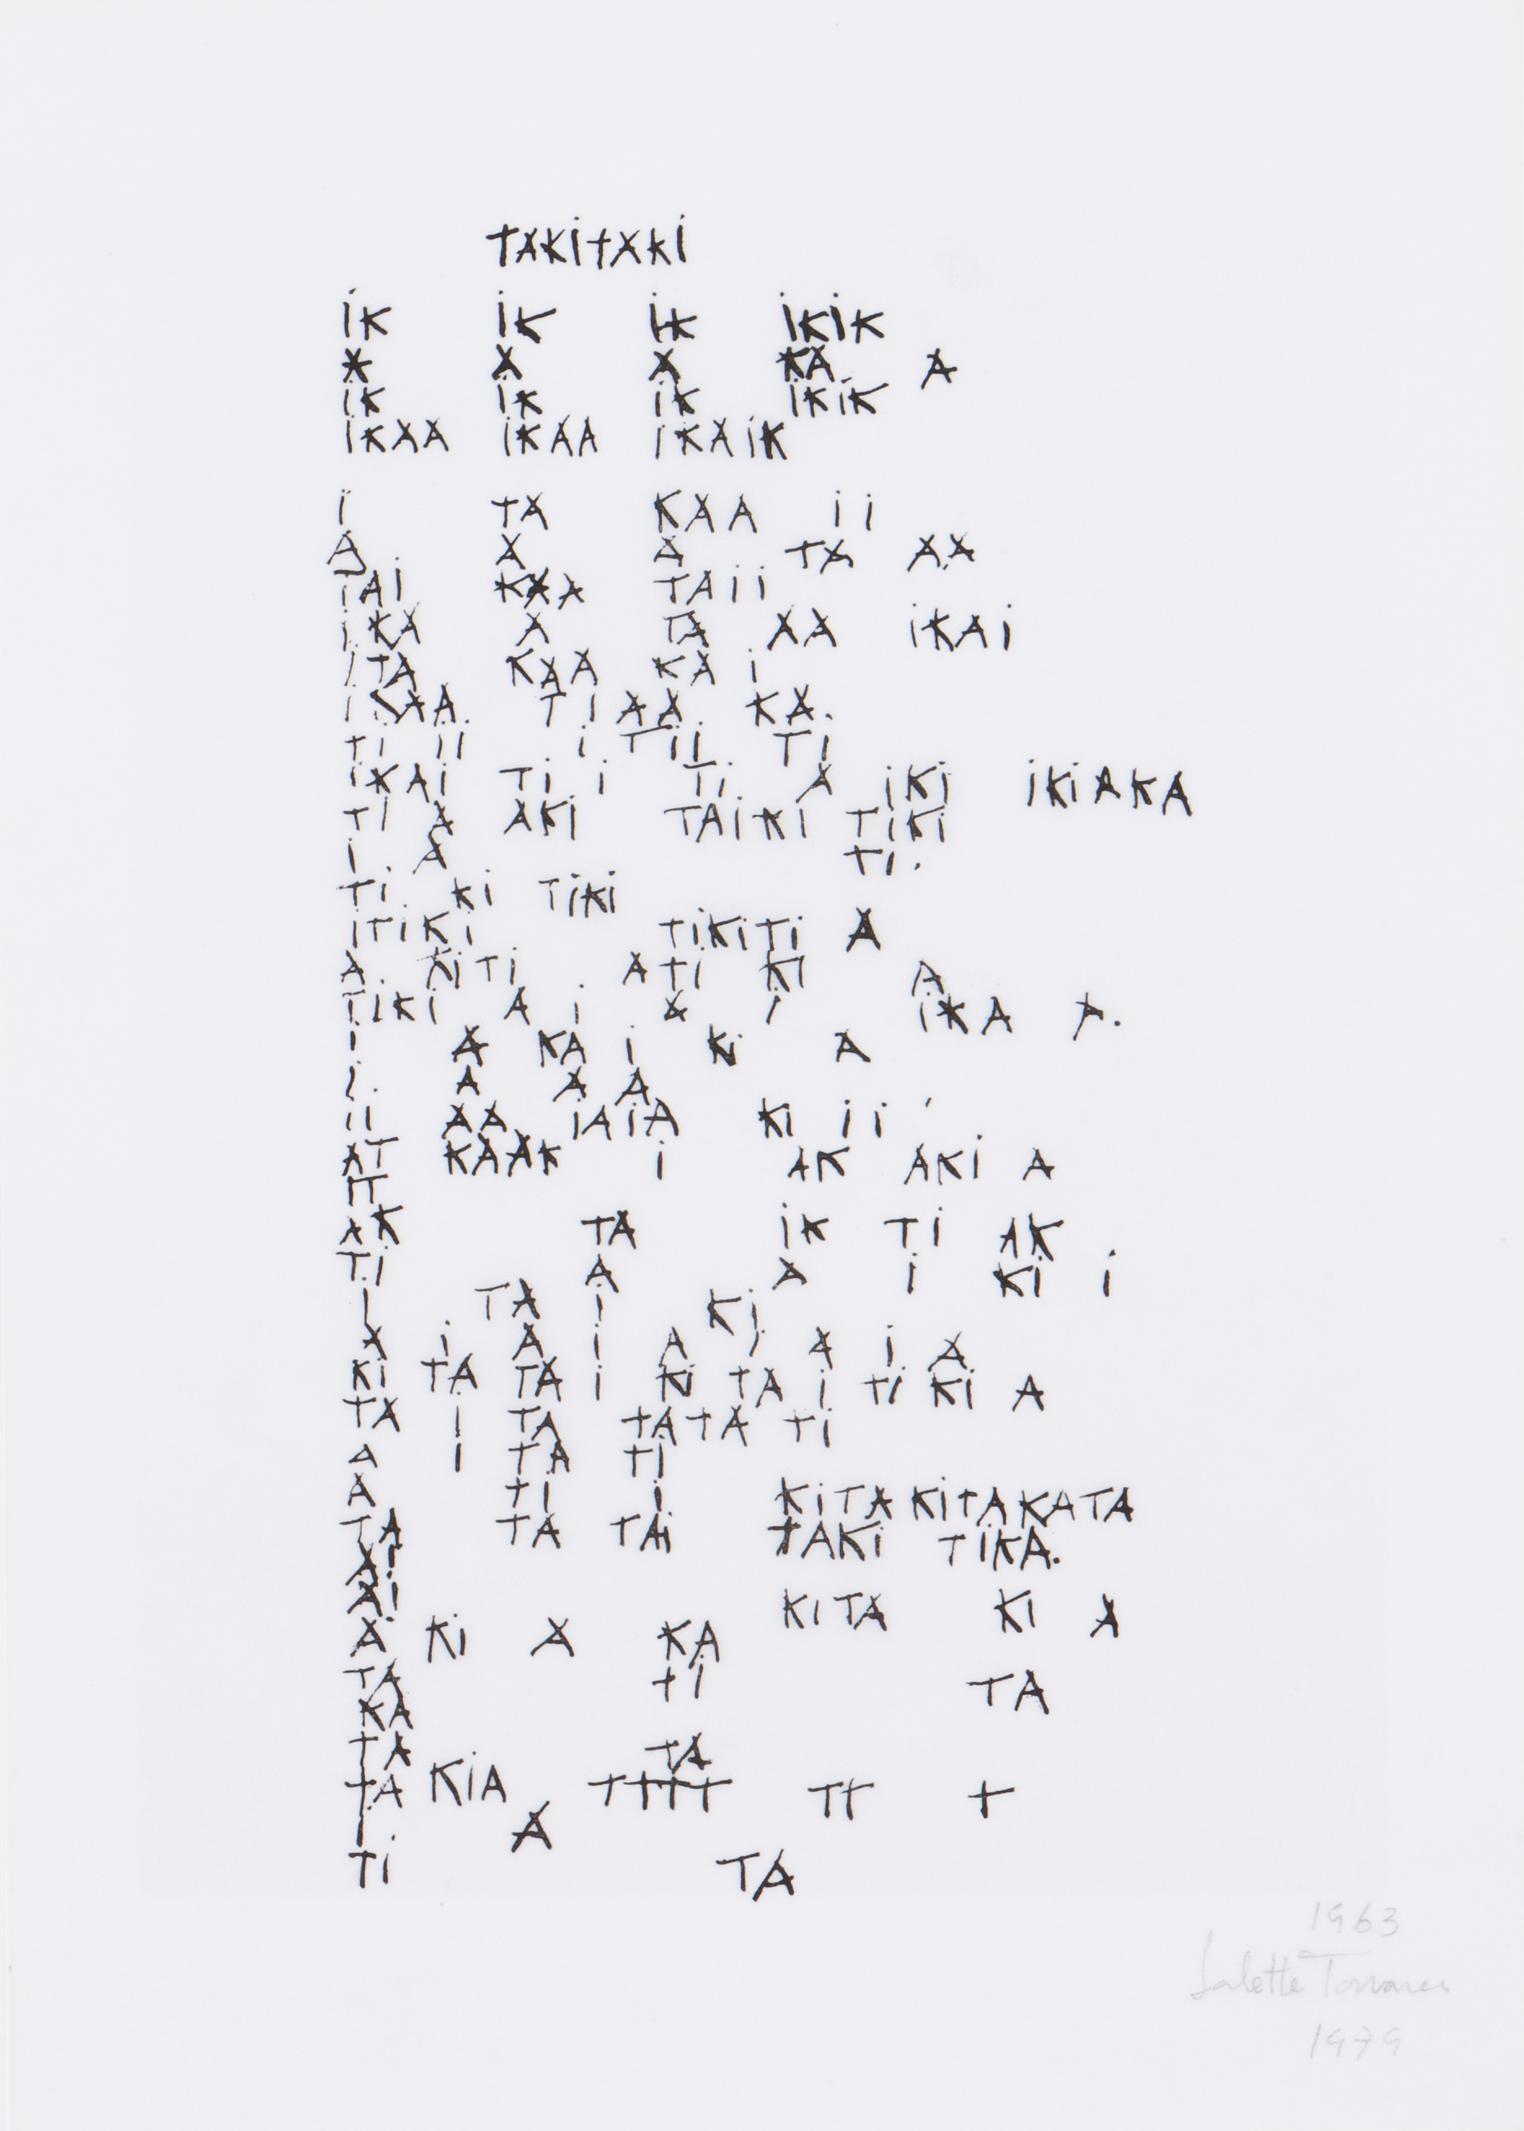 Salette Tavares - Taki Taki (Kinetofonia/Kinetophonic Work)-1979